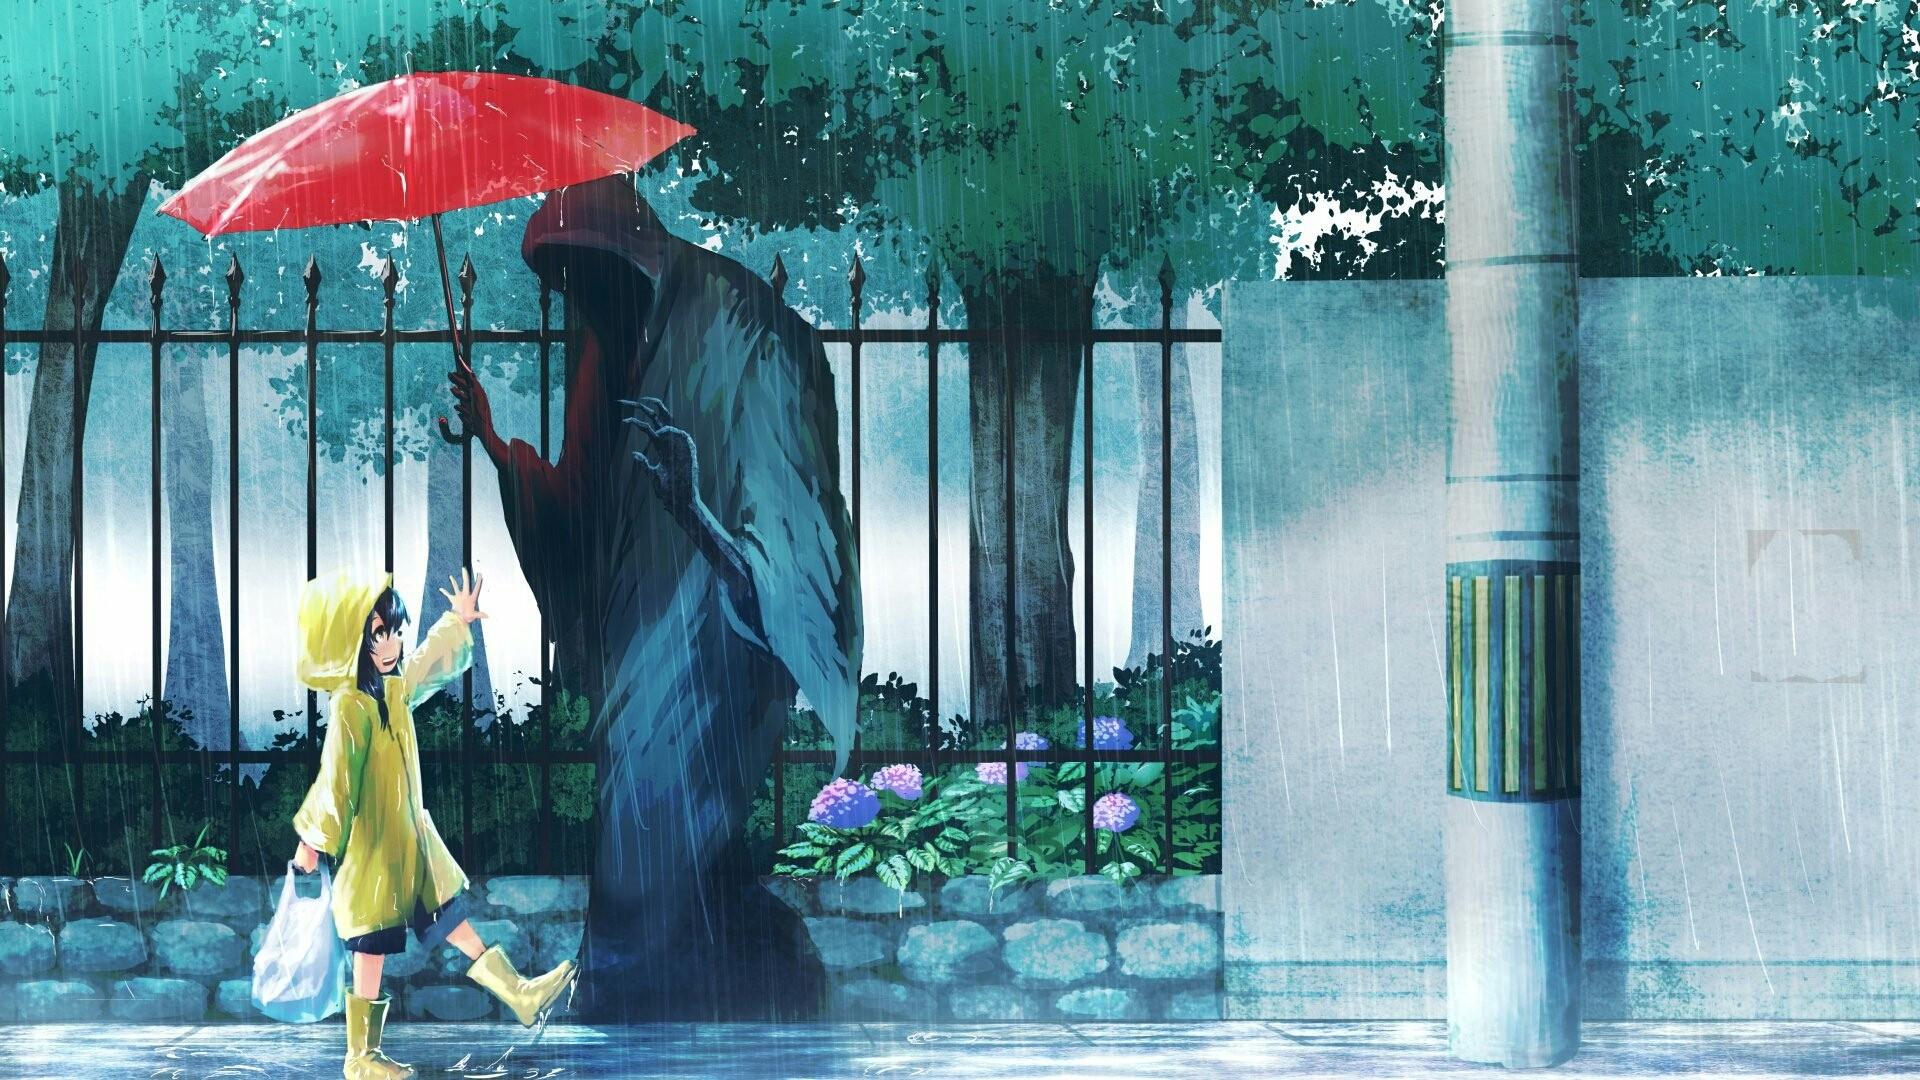 Anime Rain HD Wallpaper